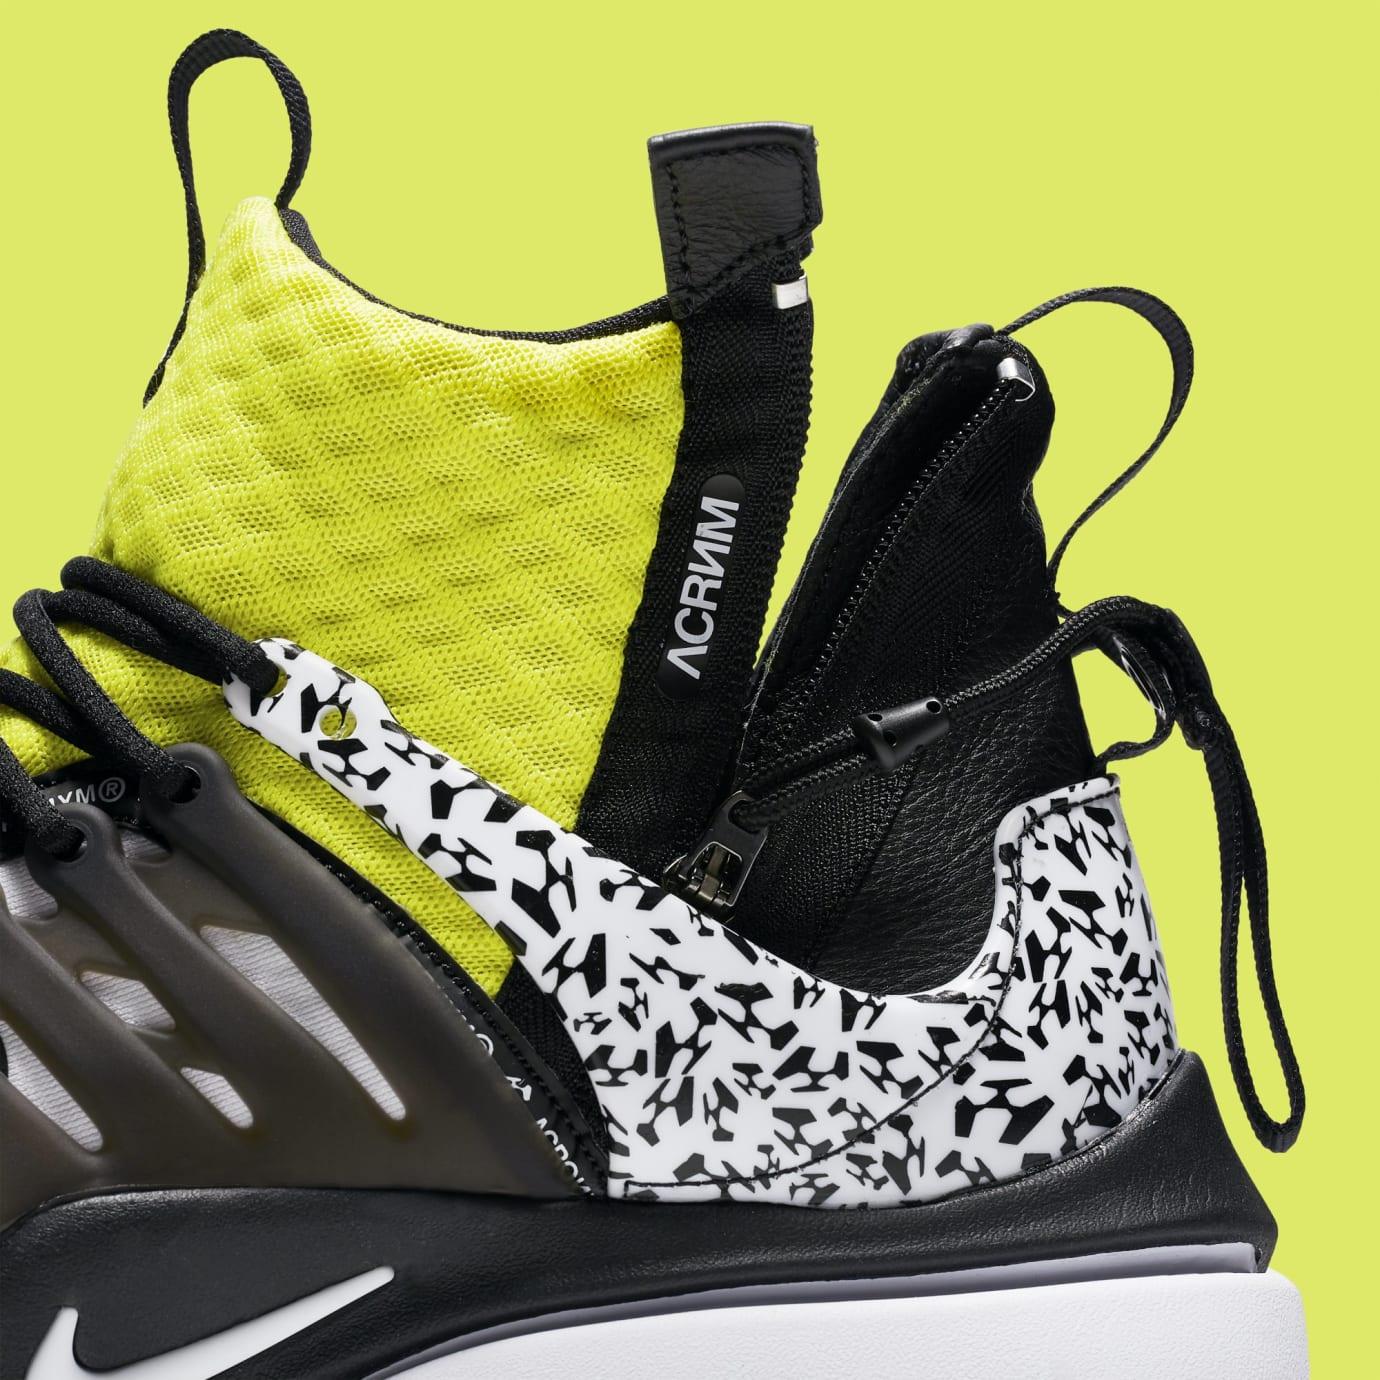 Acronym x Nike Air Presto Mid 'White/Dynamic Yellow/Black' AH7832-100 (Detail)